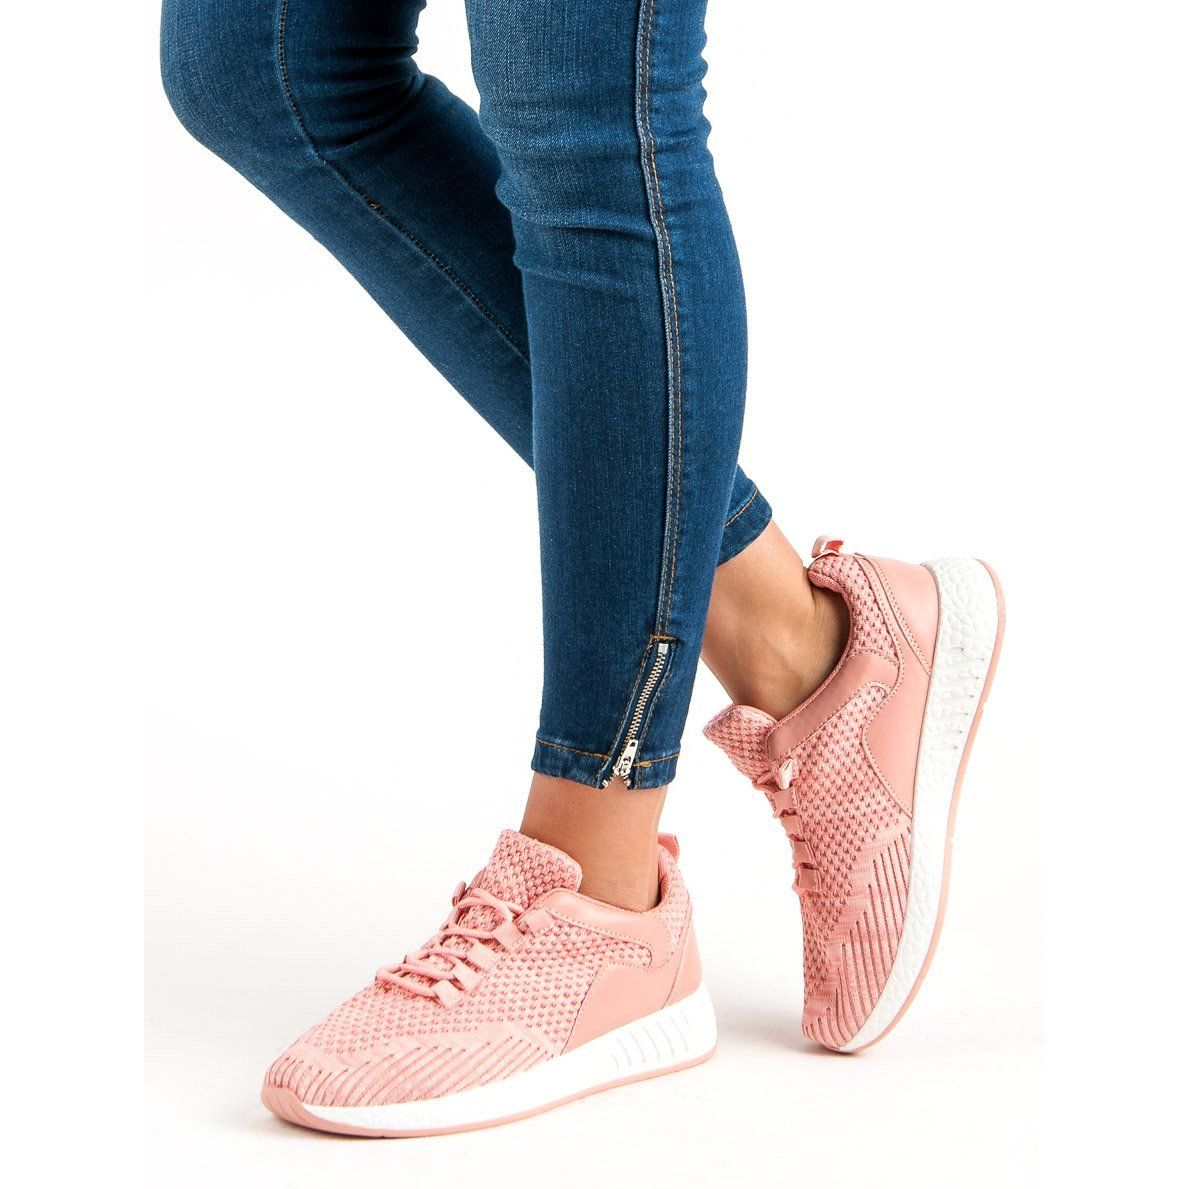 Lekkie Buty Sportowe Rozowe Shoes Puma Sneaker Fashion